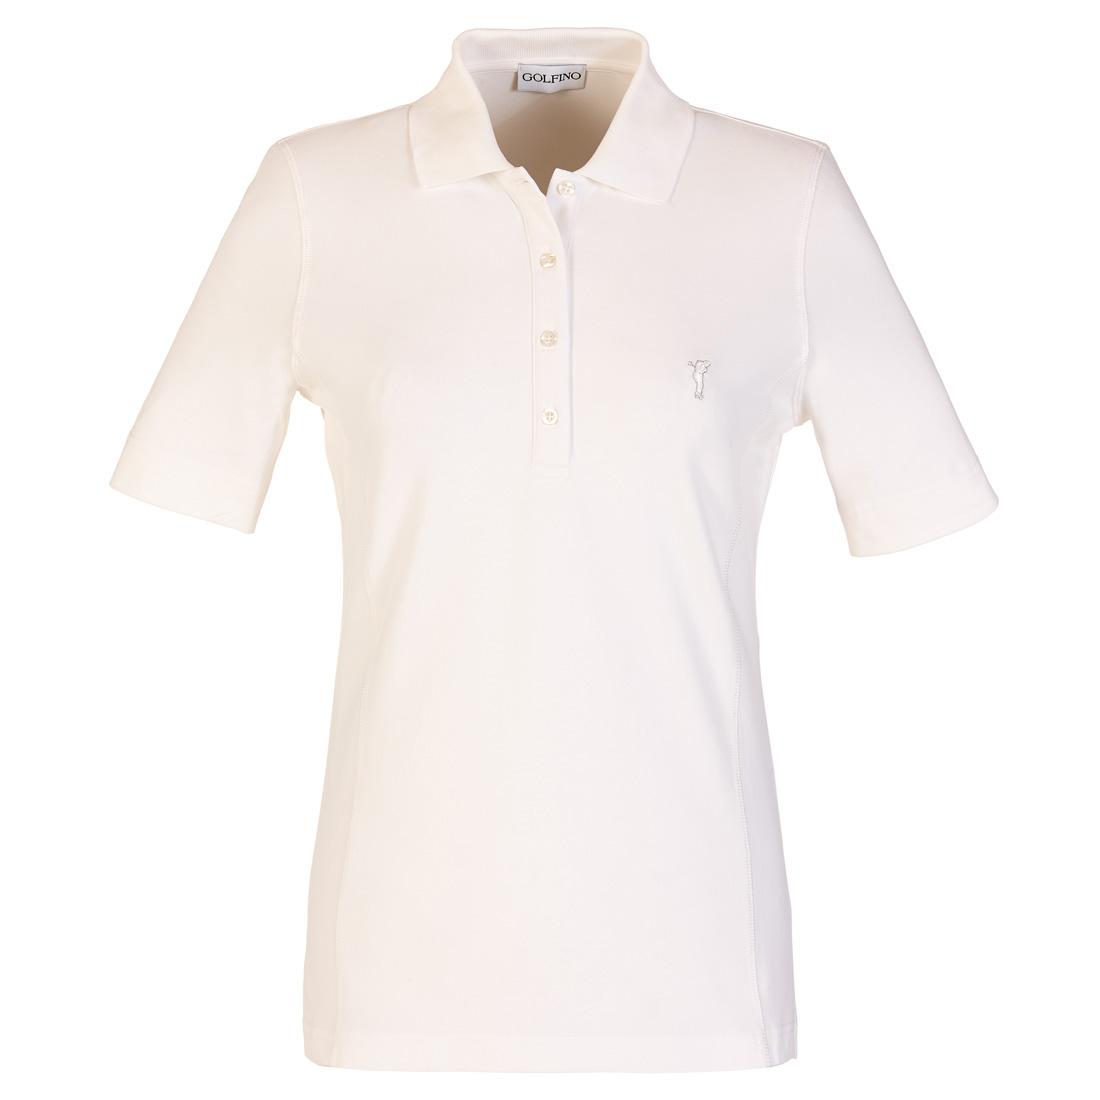 Kurzarm Poloshirt mit Sonnenschutz